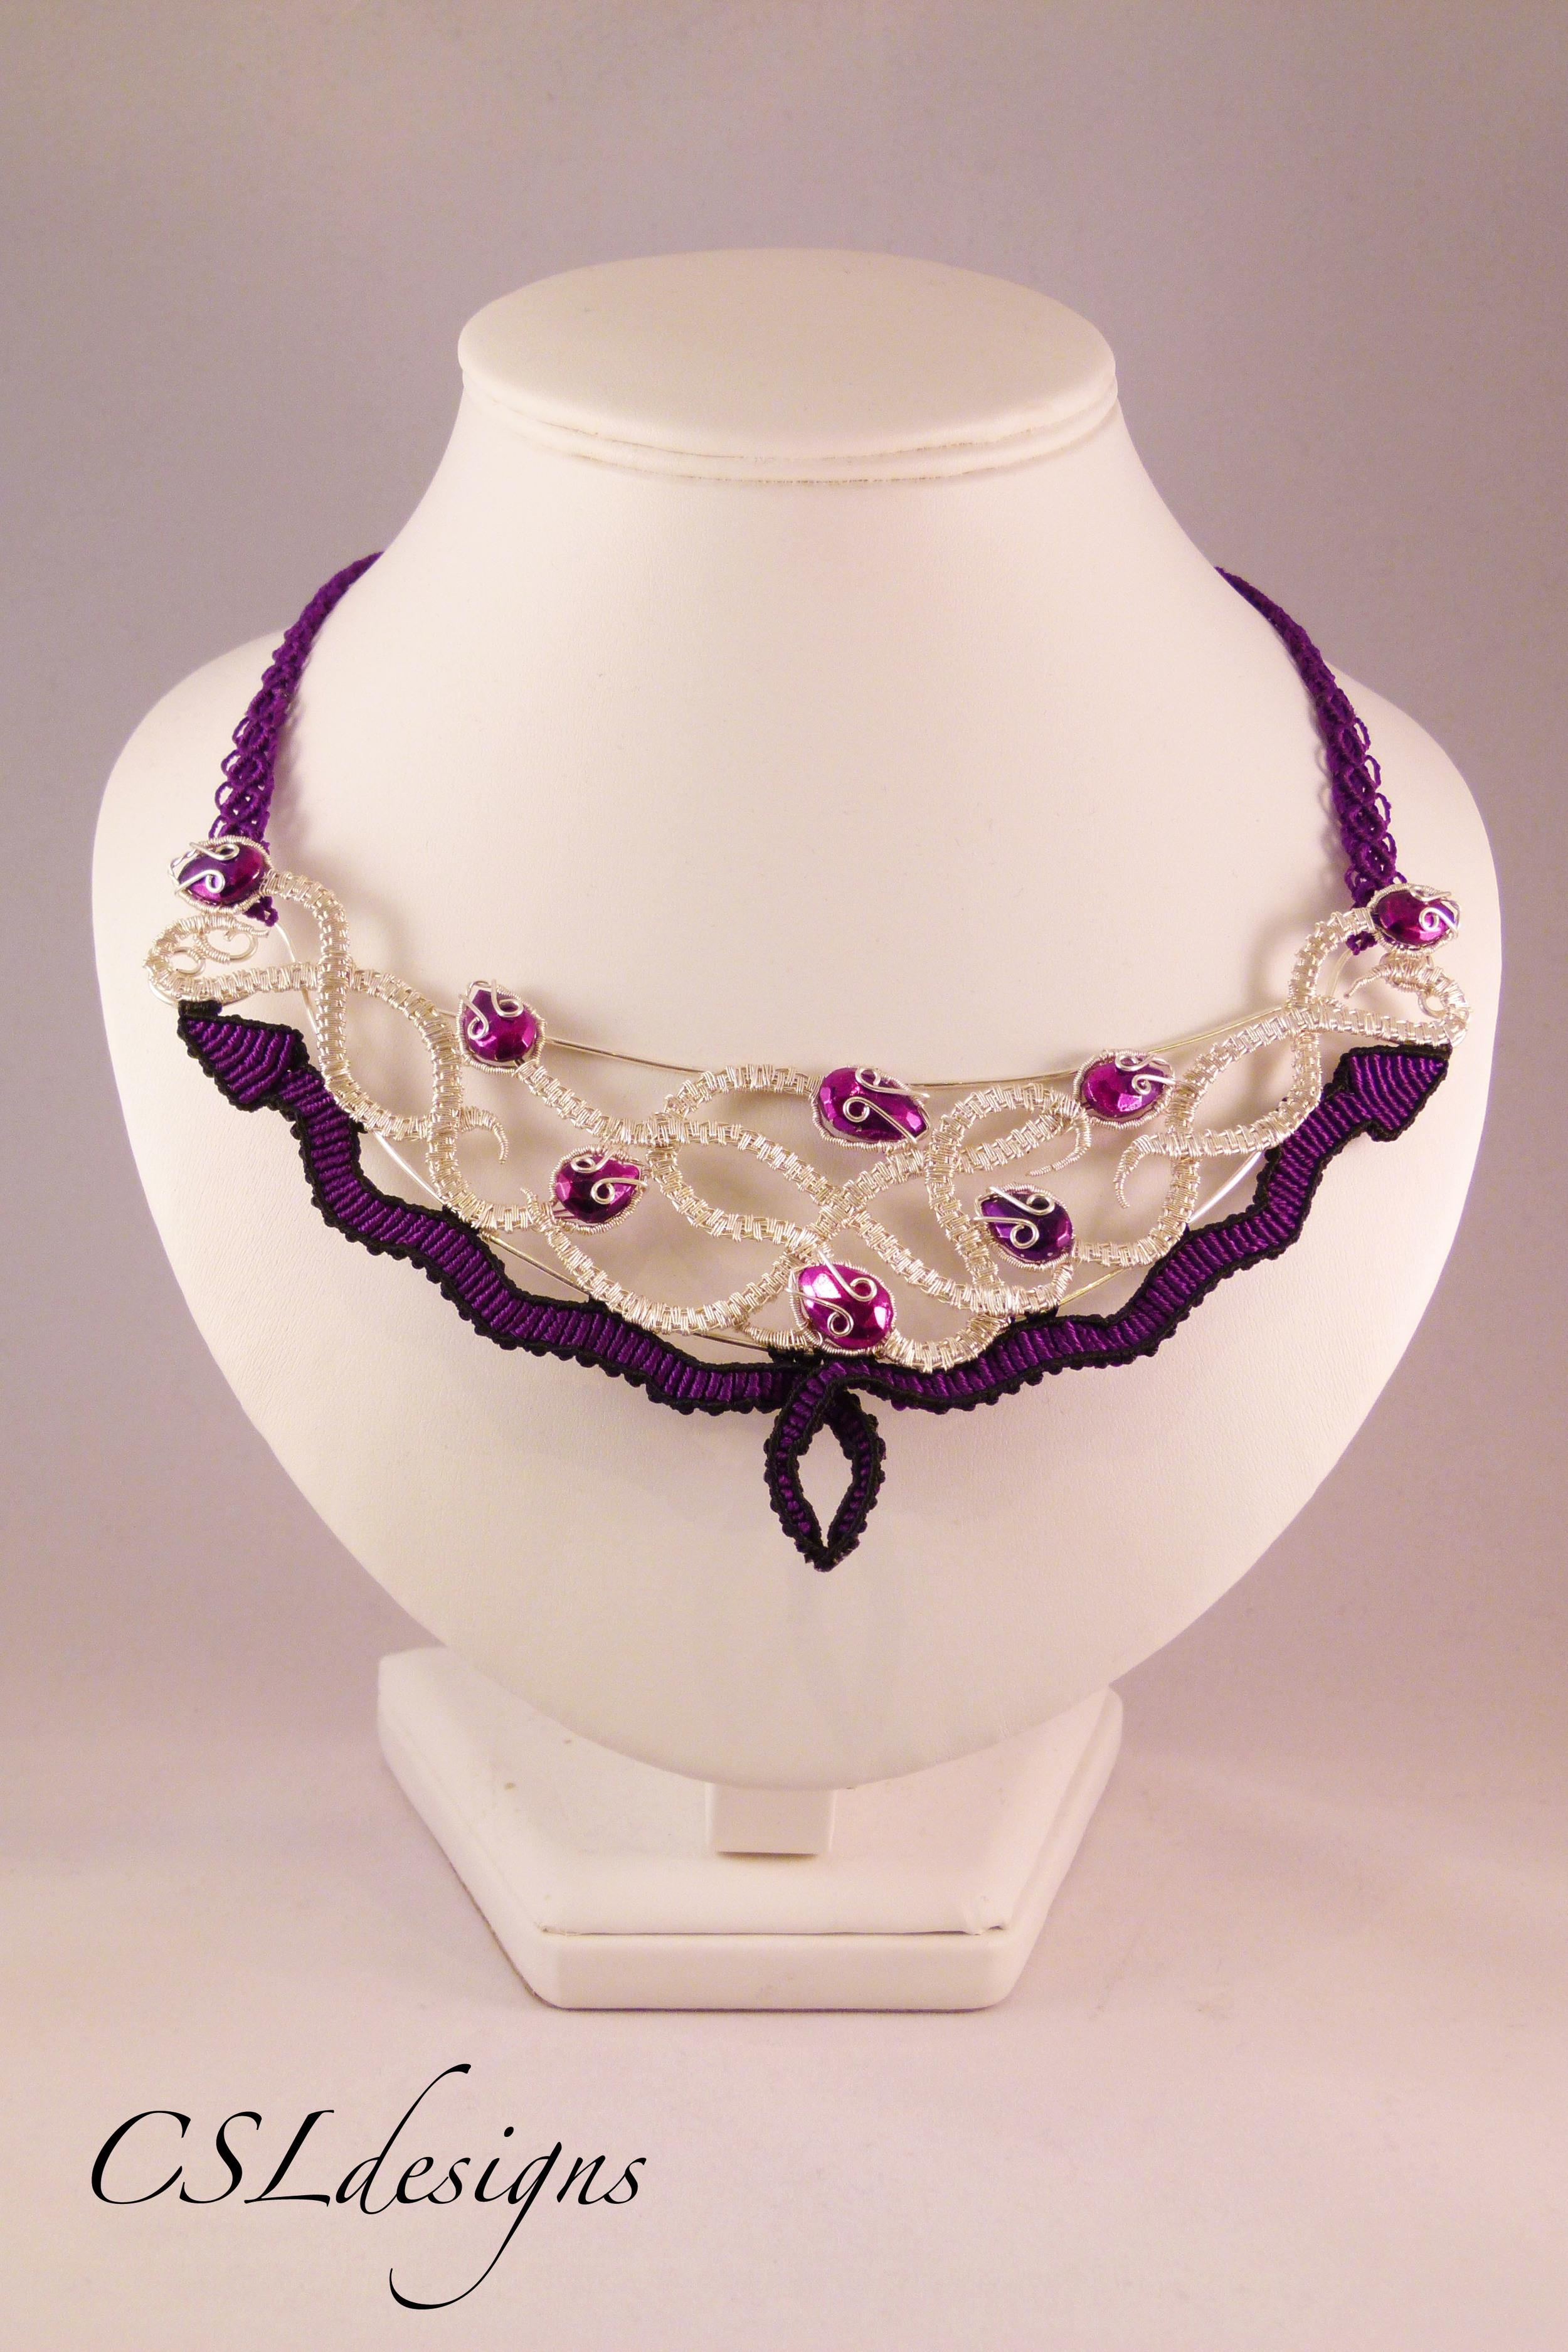 Micro macrame wirework snake necklace front full.jpg